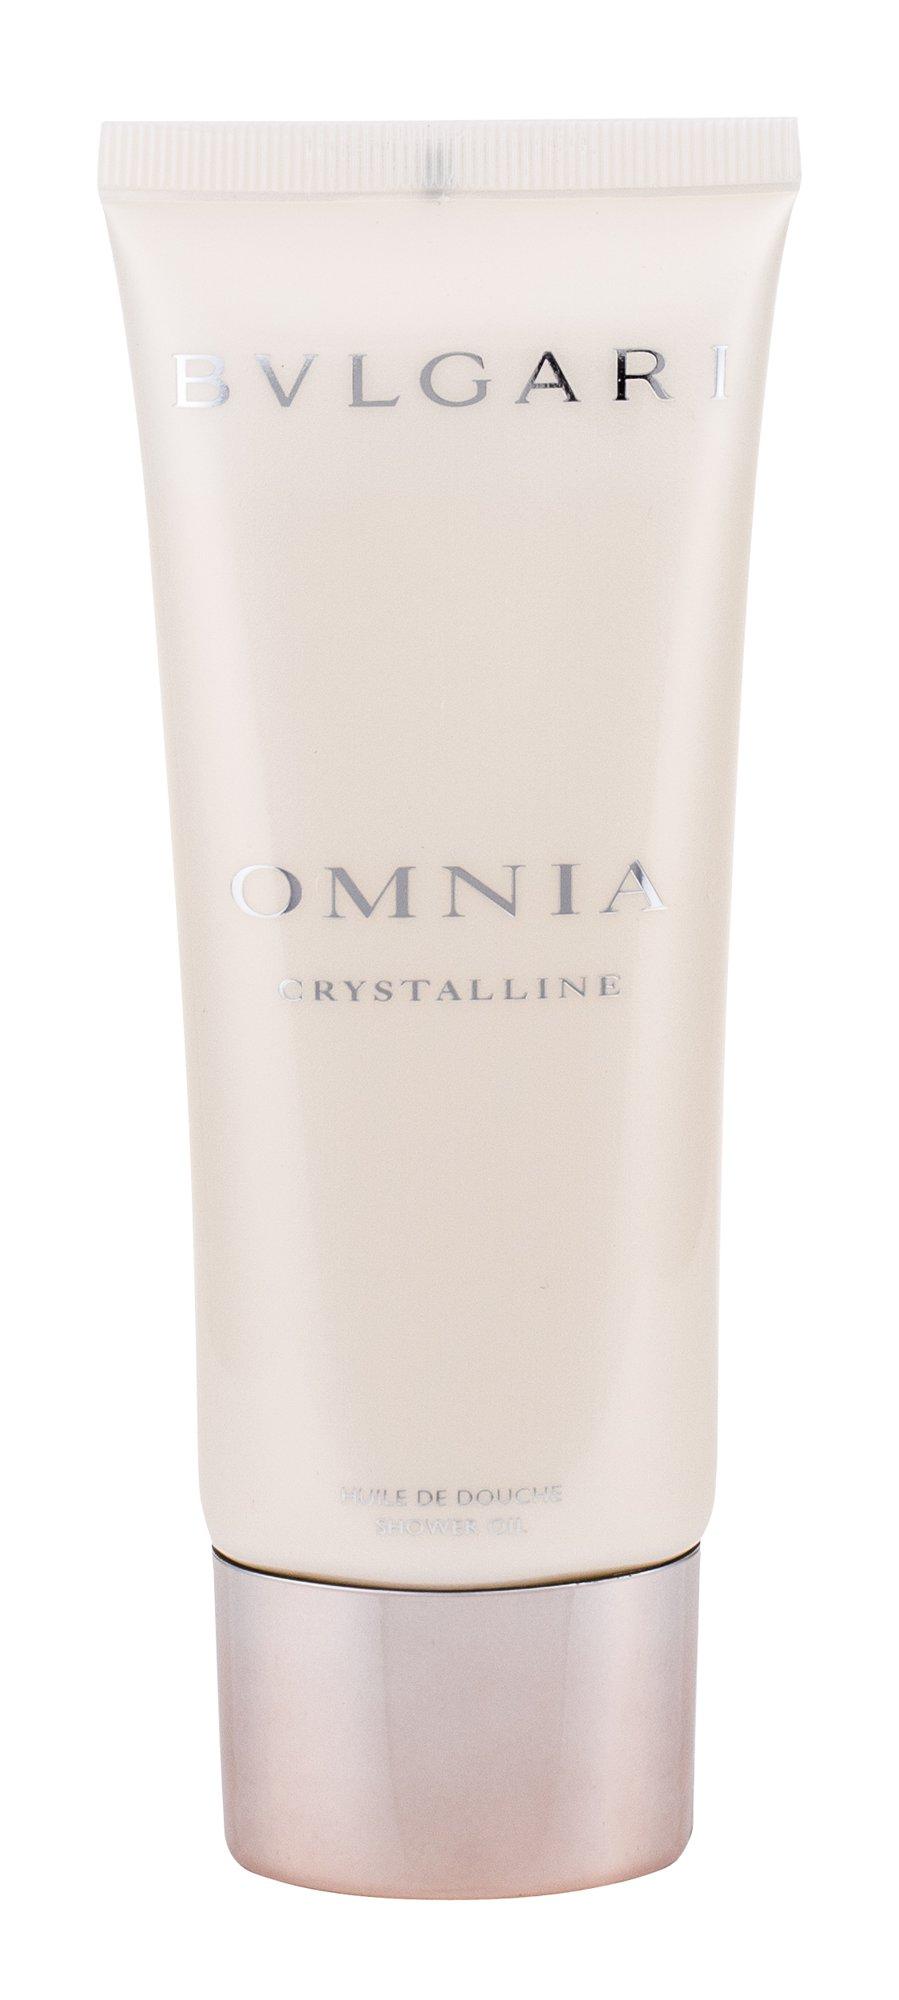 Bvlgari Omnia Crystalline, Sprchovací olej 100ml